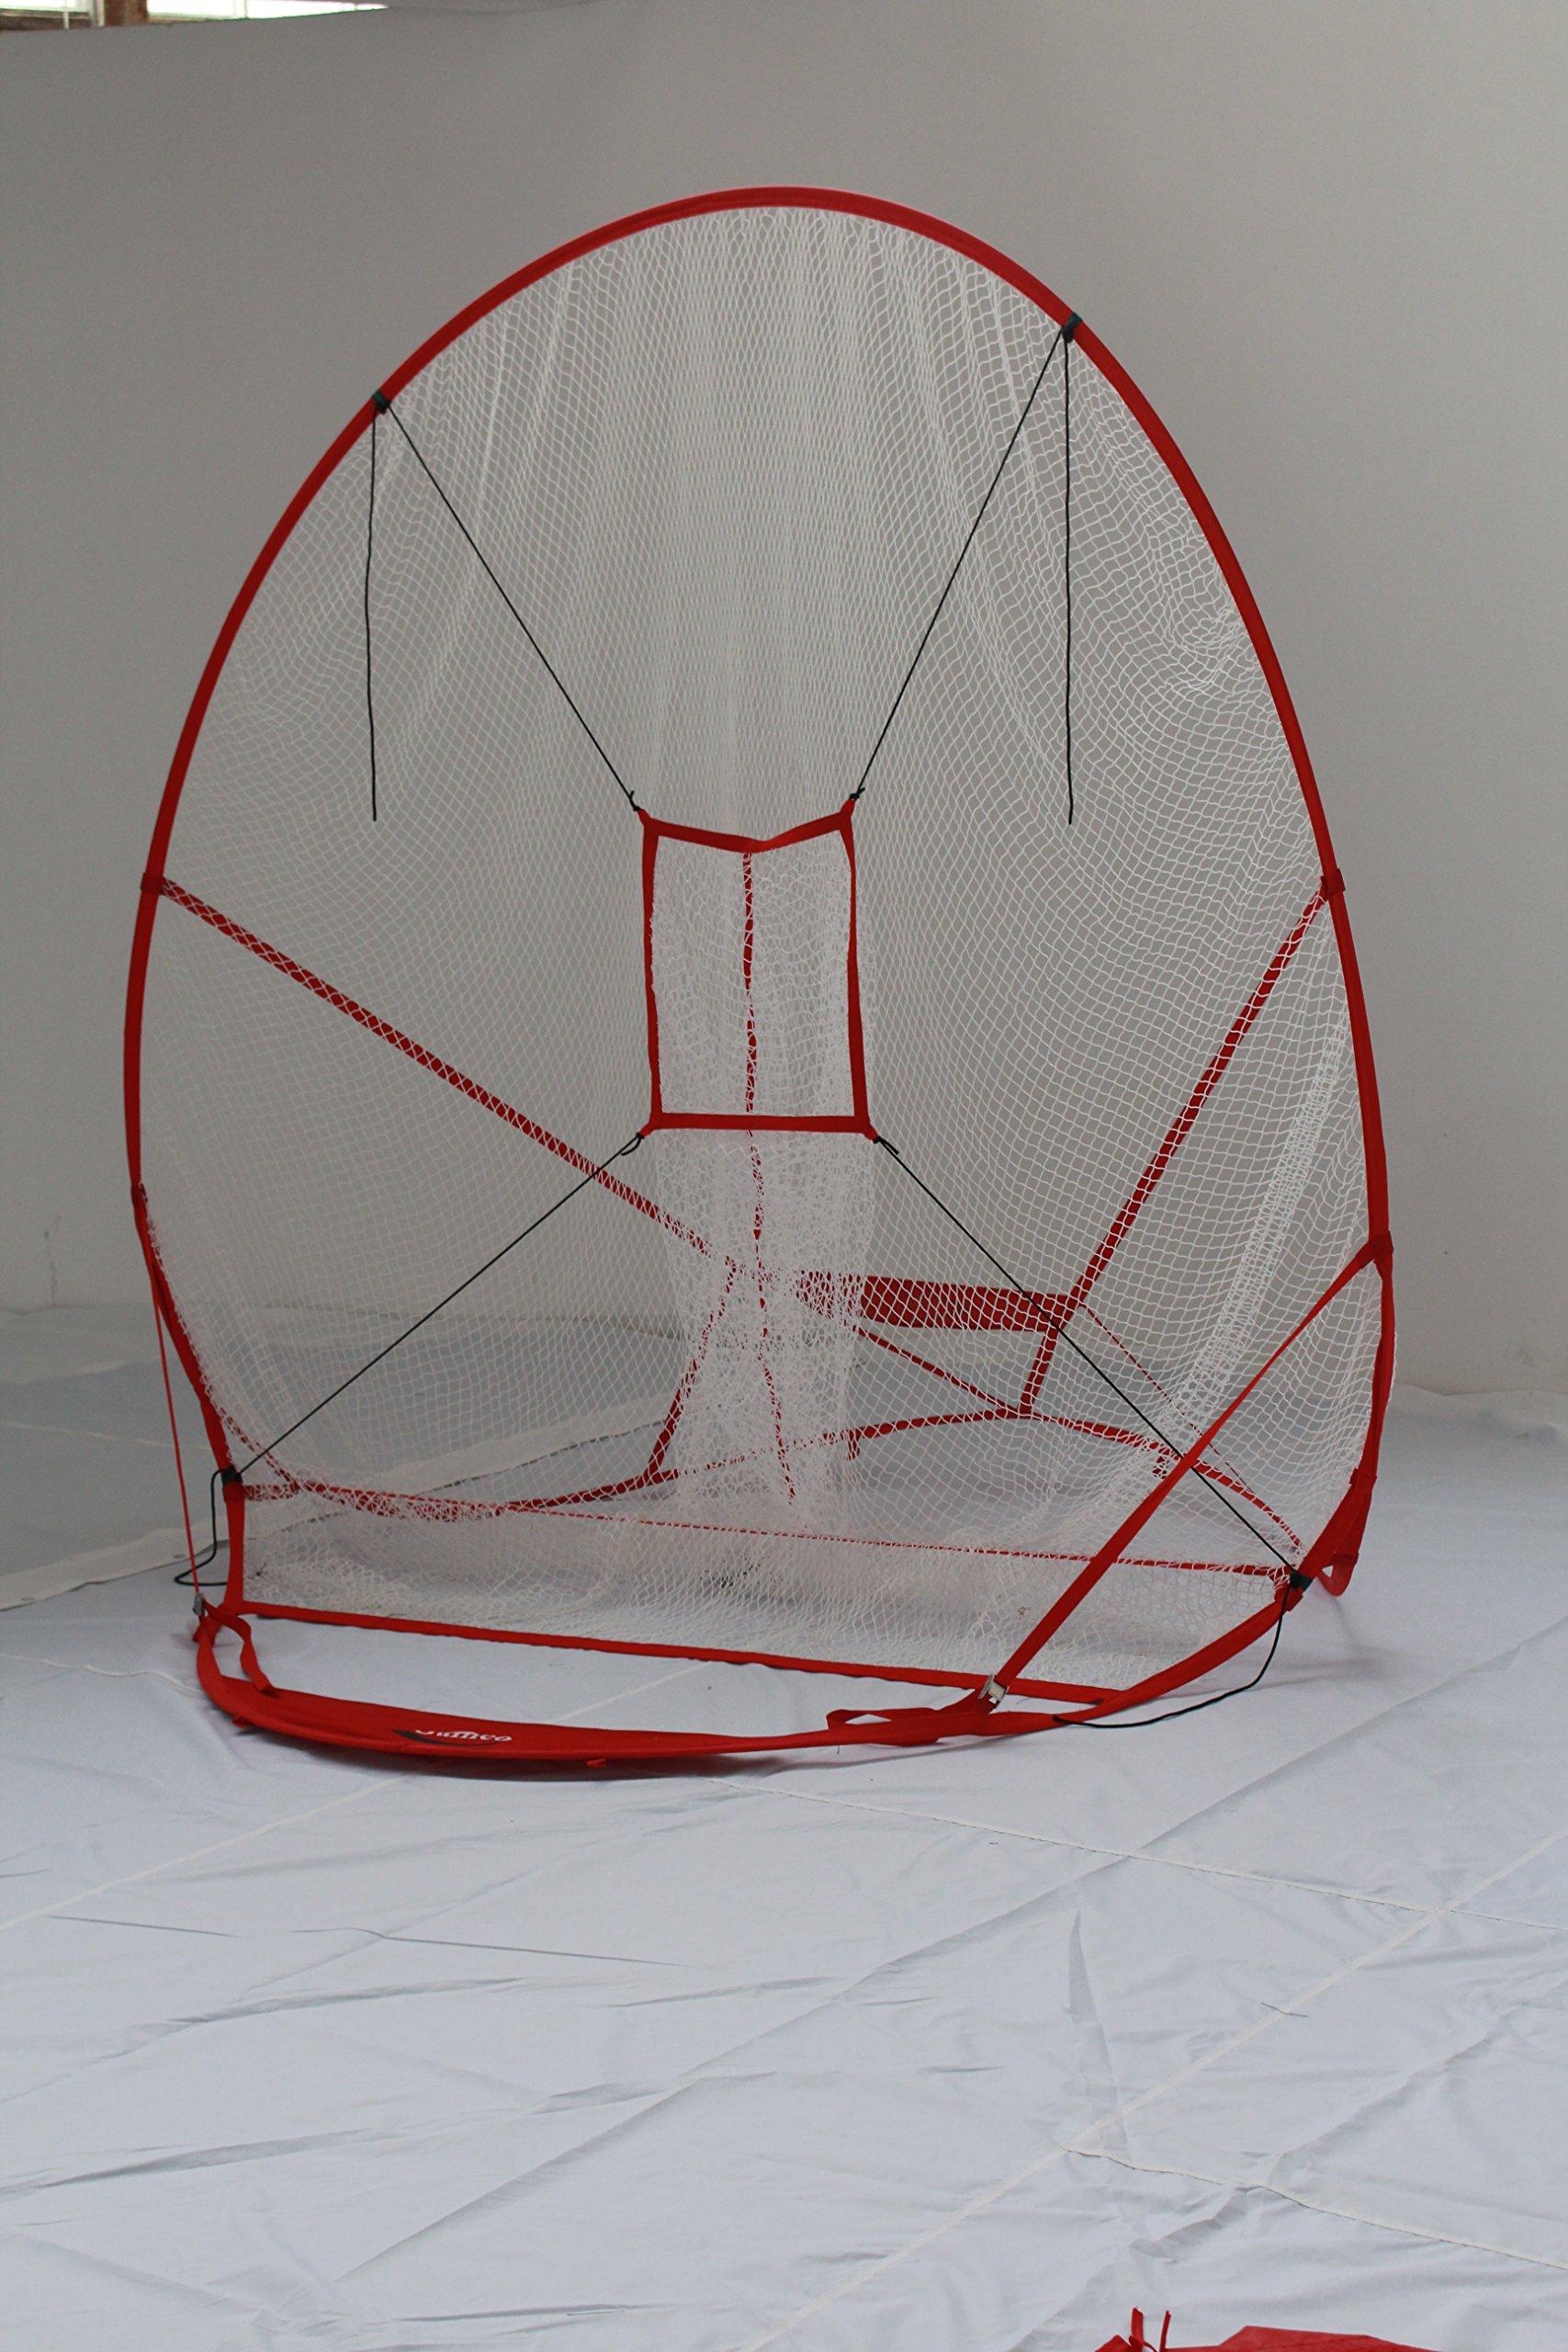 7' X 7'New Redesigned Instant Screen batting net||Baseball Softball net | 7x7 Hitting Net | Strike Zone Target | Carry Bag | Practice Batting, Pitching, Catching |Backstop Screen Equipment Training